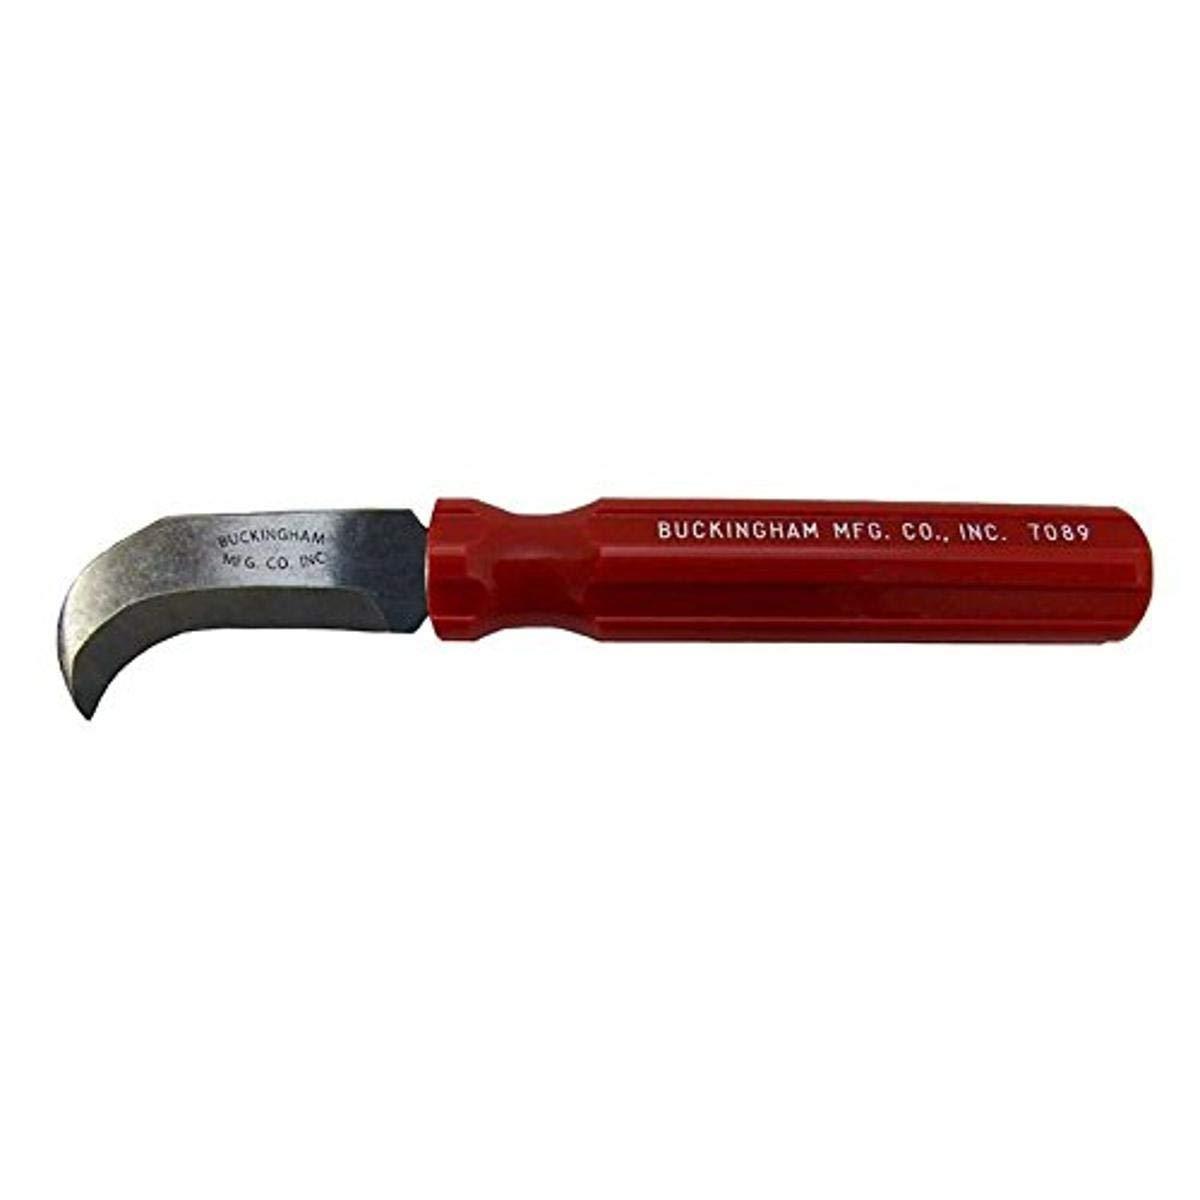 cheap Buckingham 70891 Skinning Wire Linemen Knife Max 79% OFF